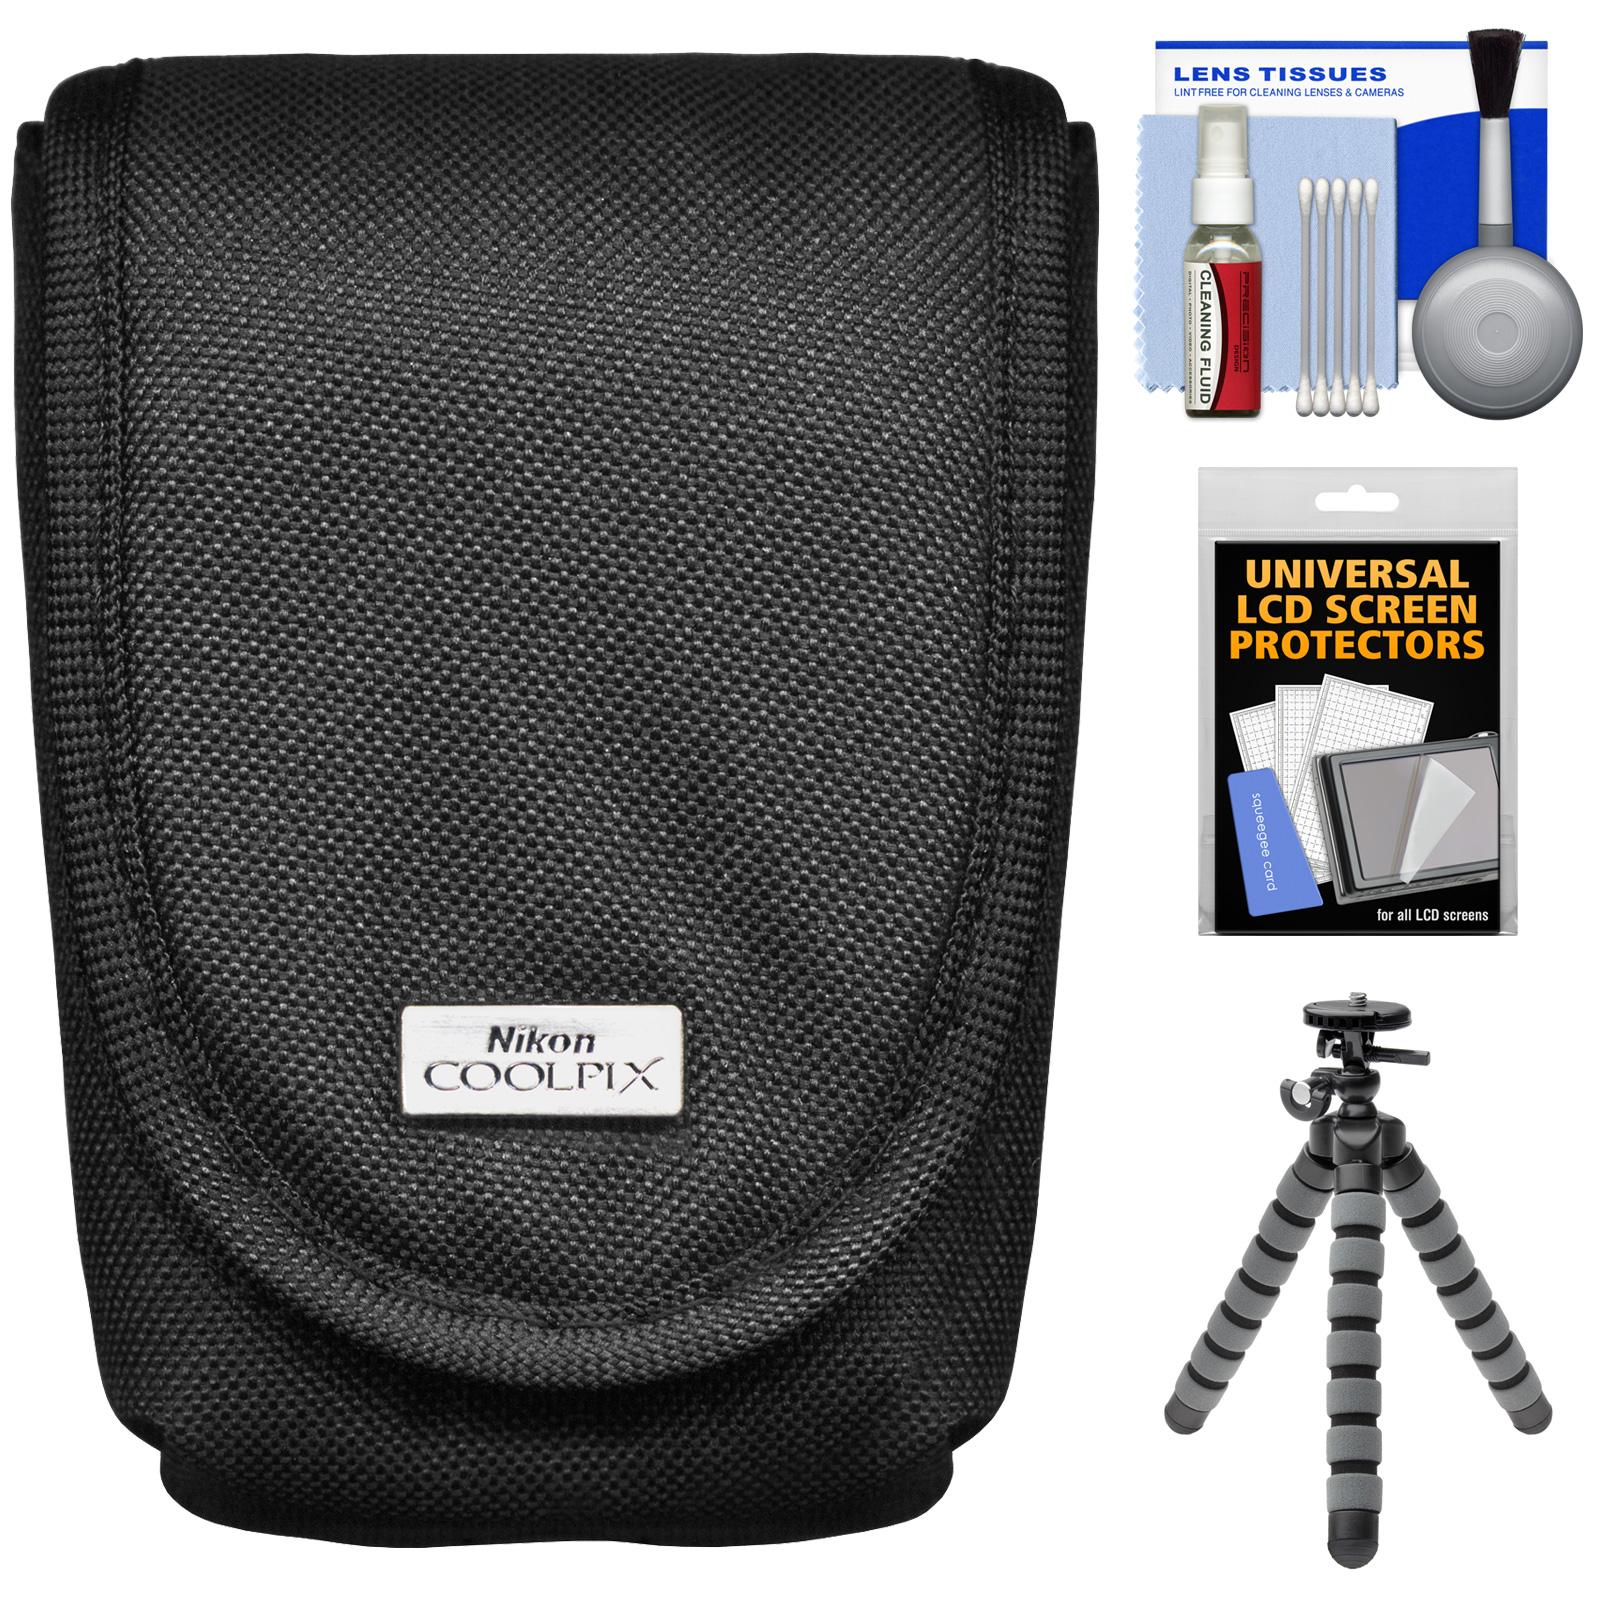 Nikon Coolpix 5879 Digital Camera Case with Flex Tripod + Accessory Kit for AW110, AW120, P340, S01, S02, S31, S32, S3500, S5200, S5300, S6500, S6800, S810C, S9500, S9700